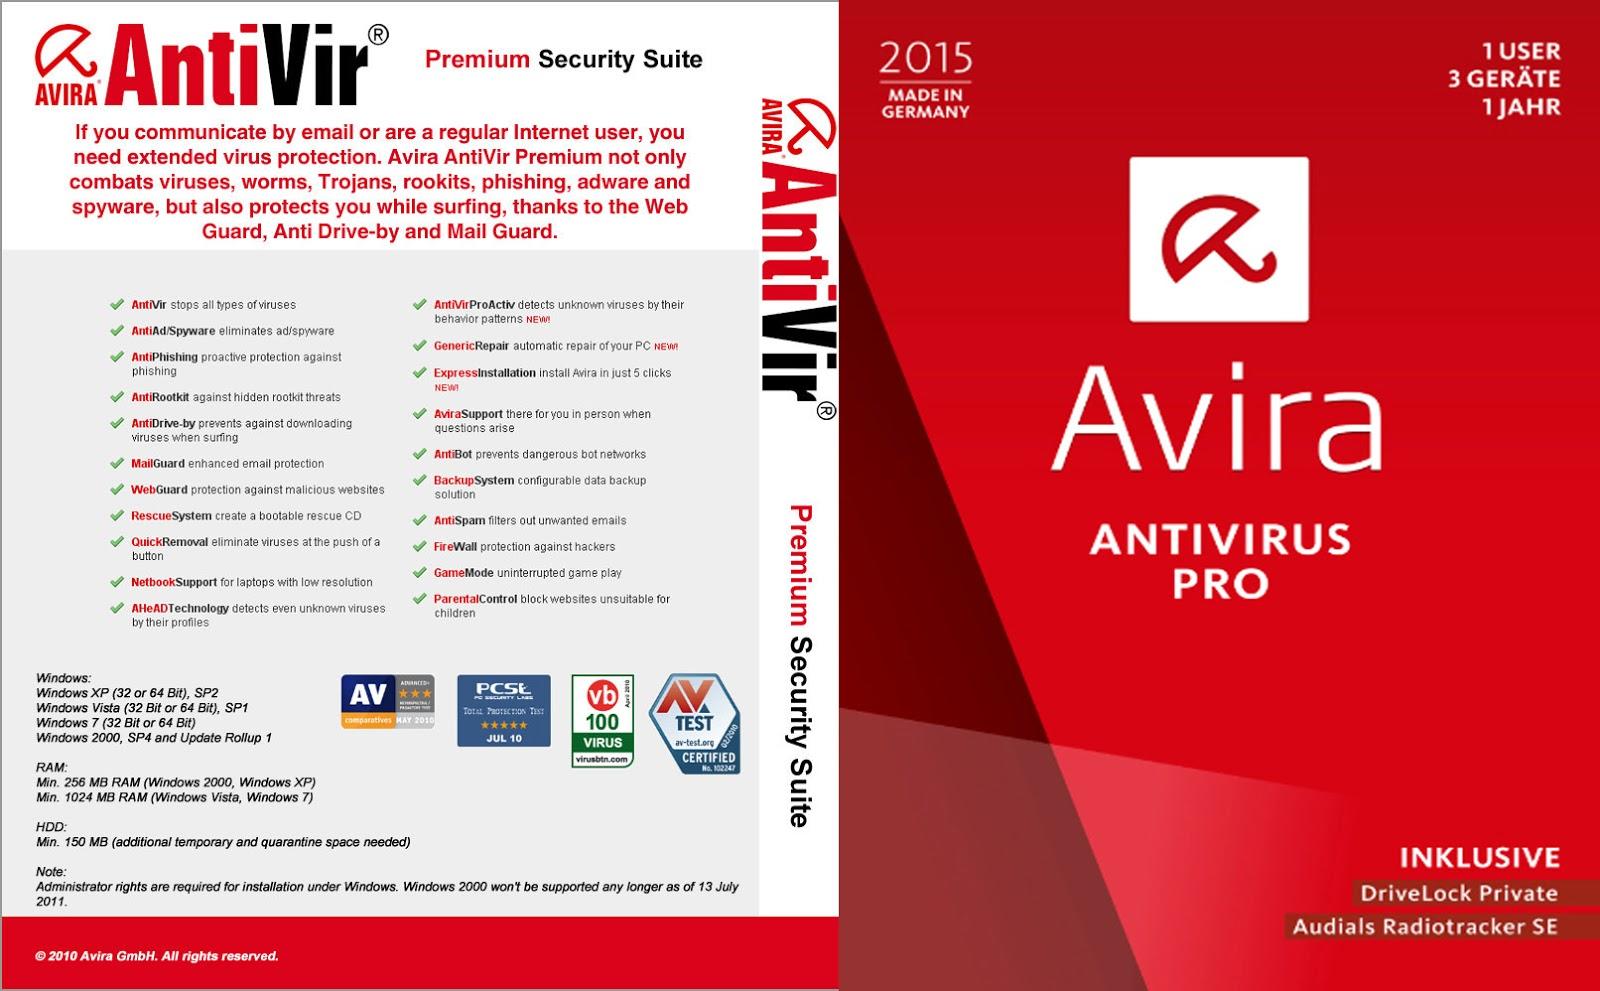 Avira Antivirus Pro 15.0.10.434 Pt-Br Avira Antivirus 2015 serial Key XANDAODOWNLLOAD